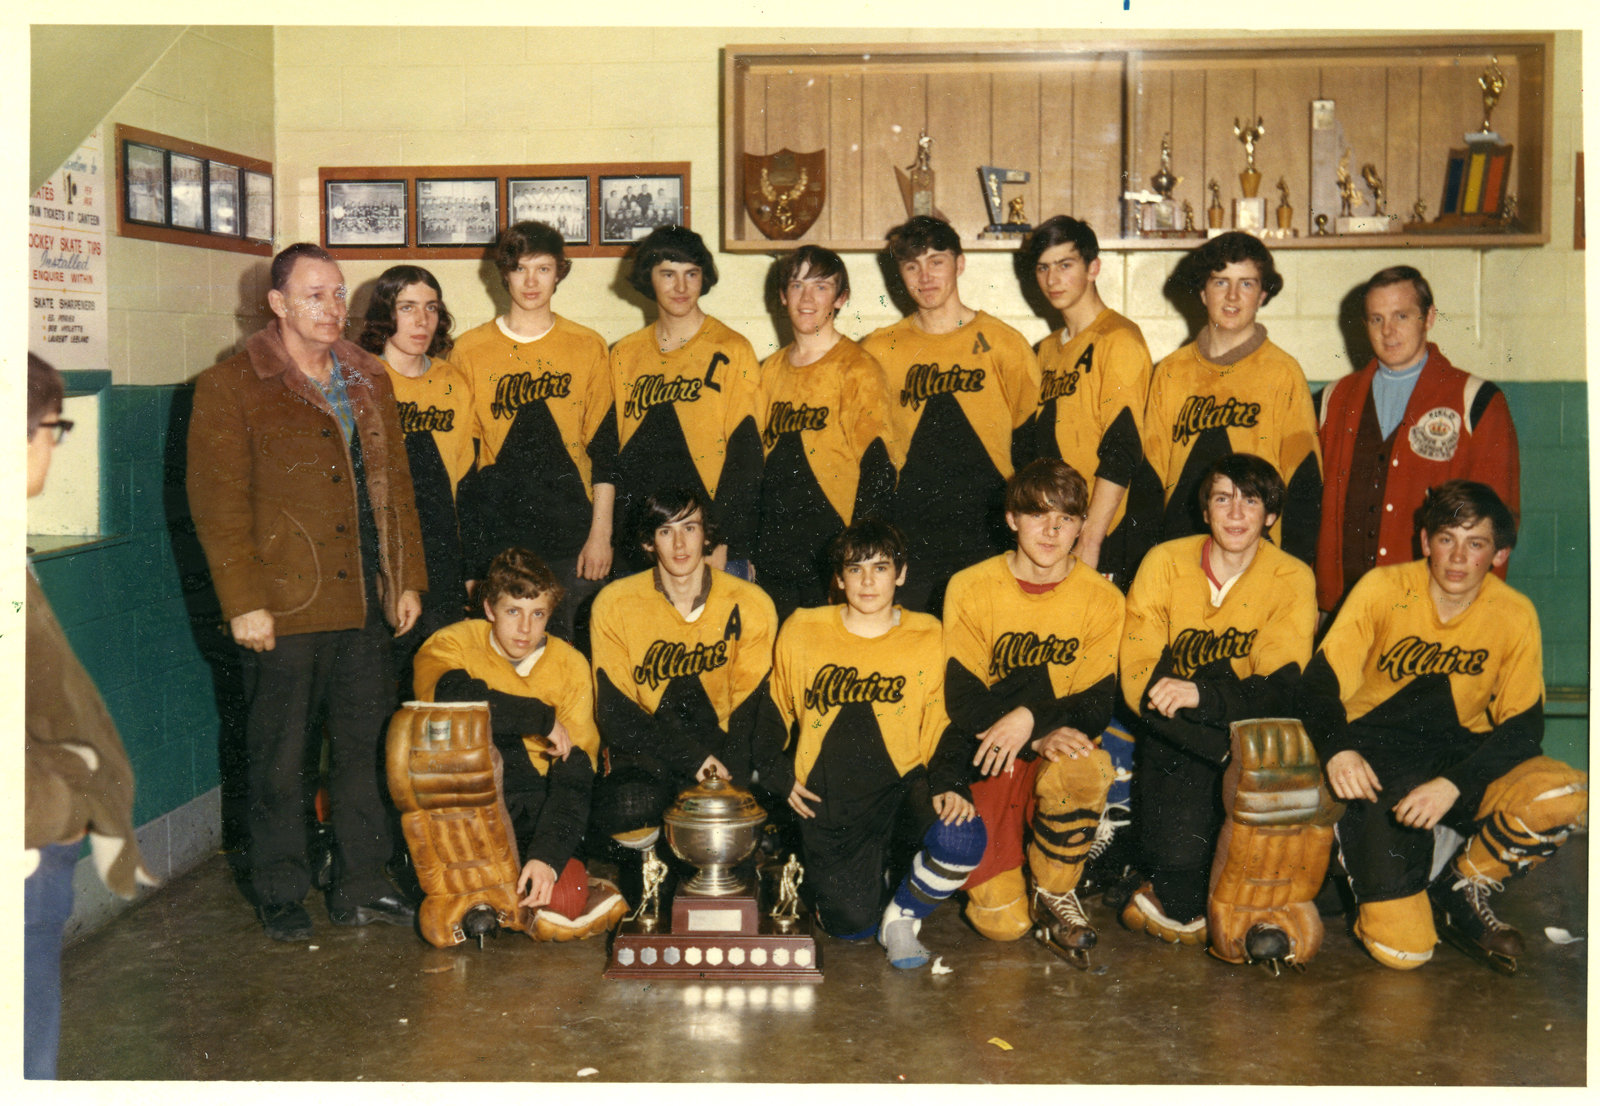 Une équipe d'hockey / A hockey team